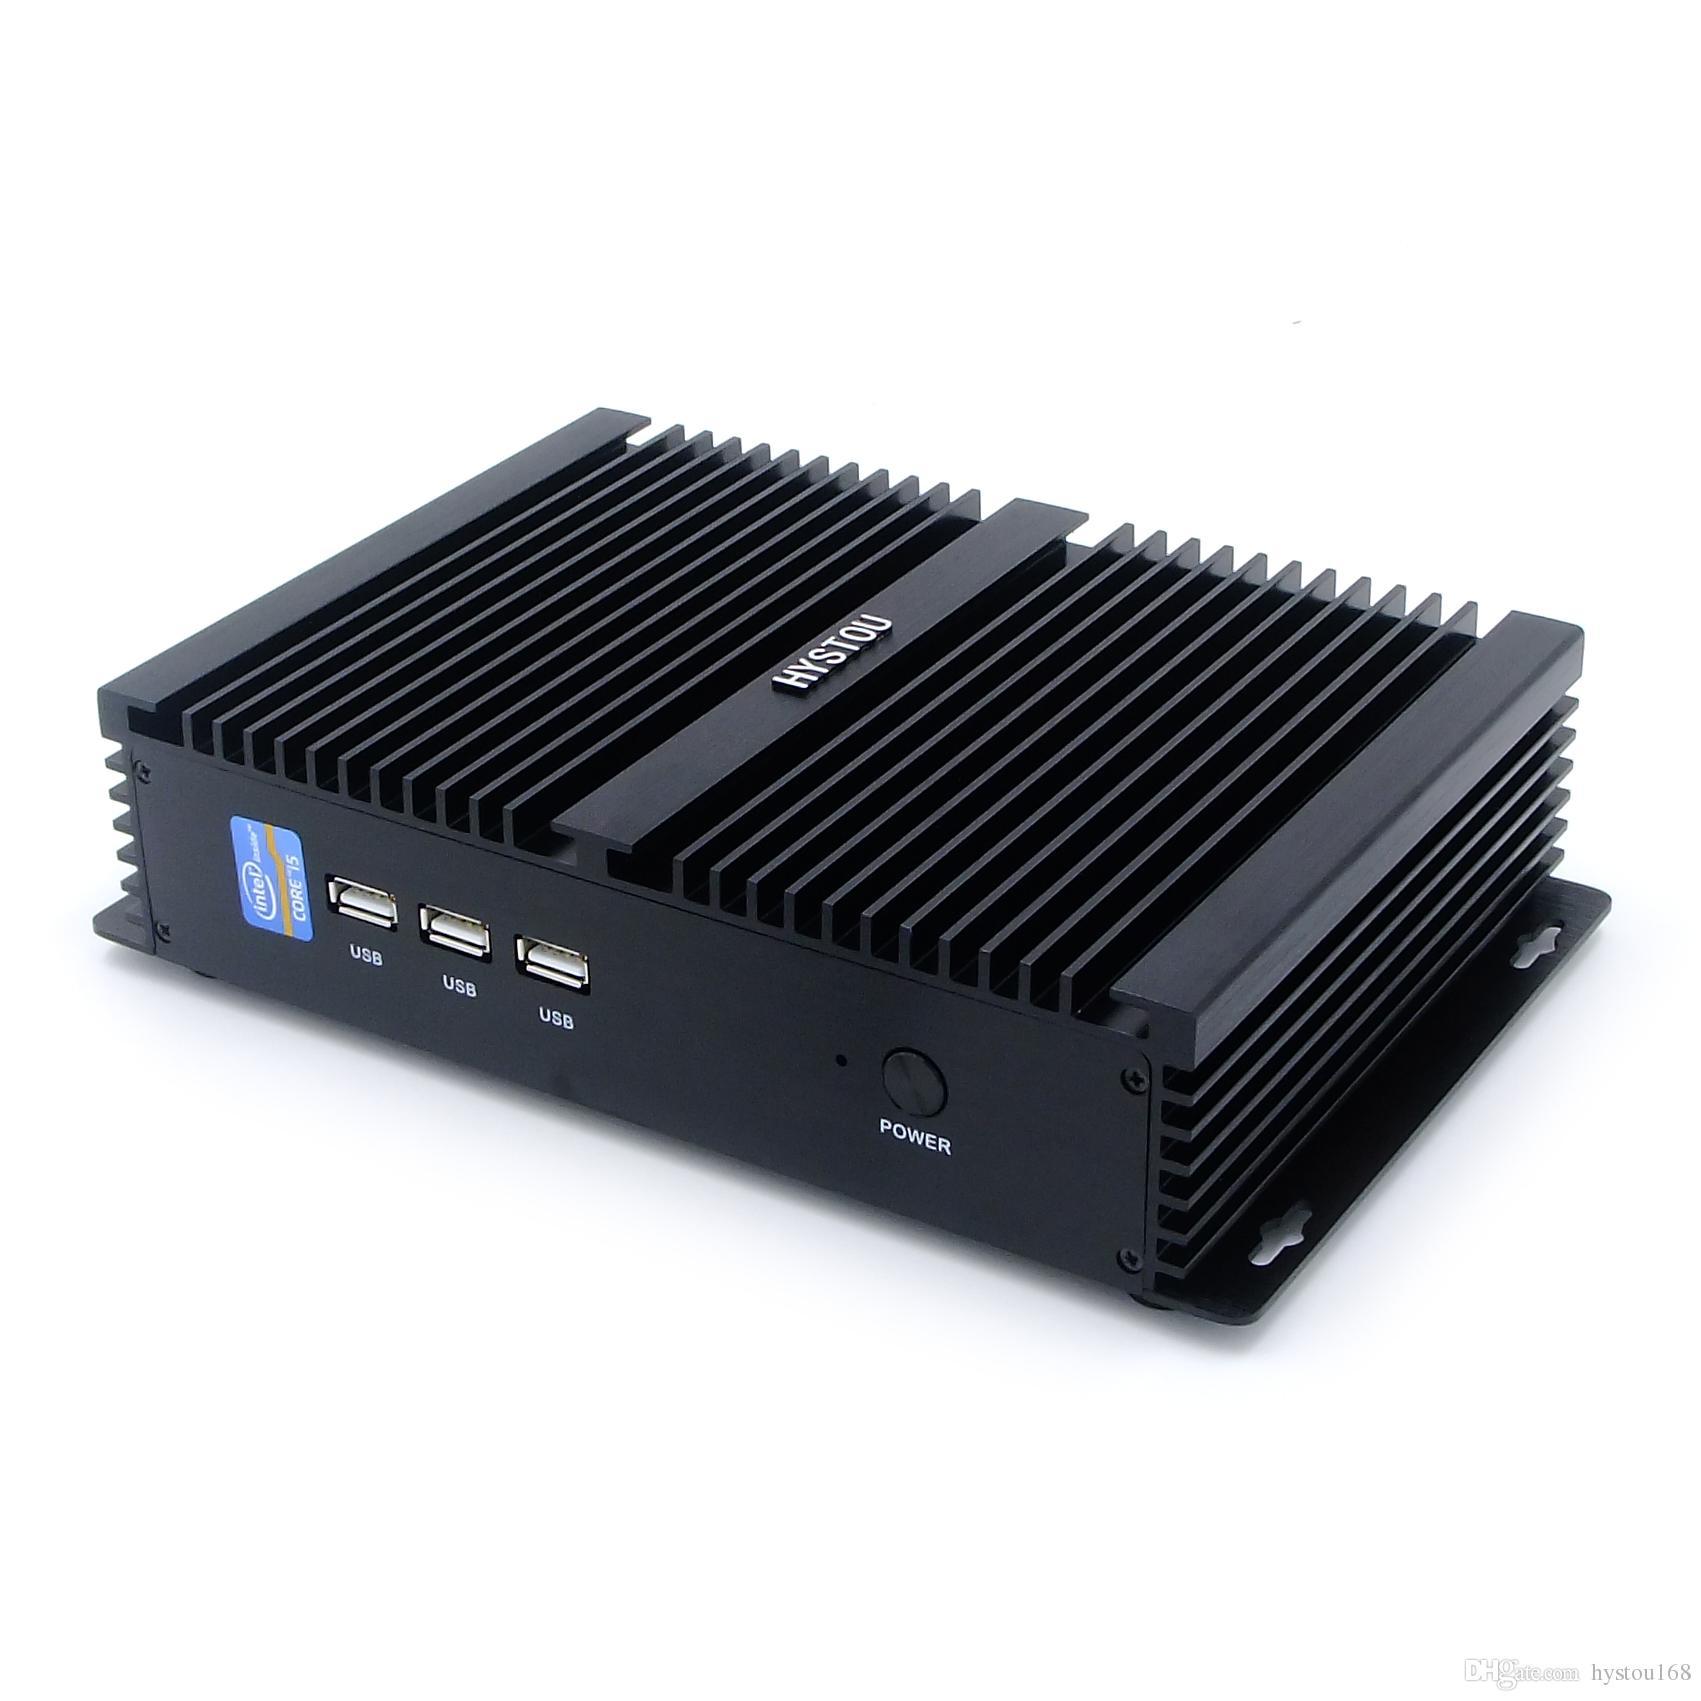 "Mini PC i7 Gigabit Lan Kablosuz Ağ Broadwell 5500u Intel bilgisayar Fansız Tam Alüminyum Alaşım durumda ddr3l Dizüstü Bellek mSATA 2.5 ""SATA"